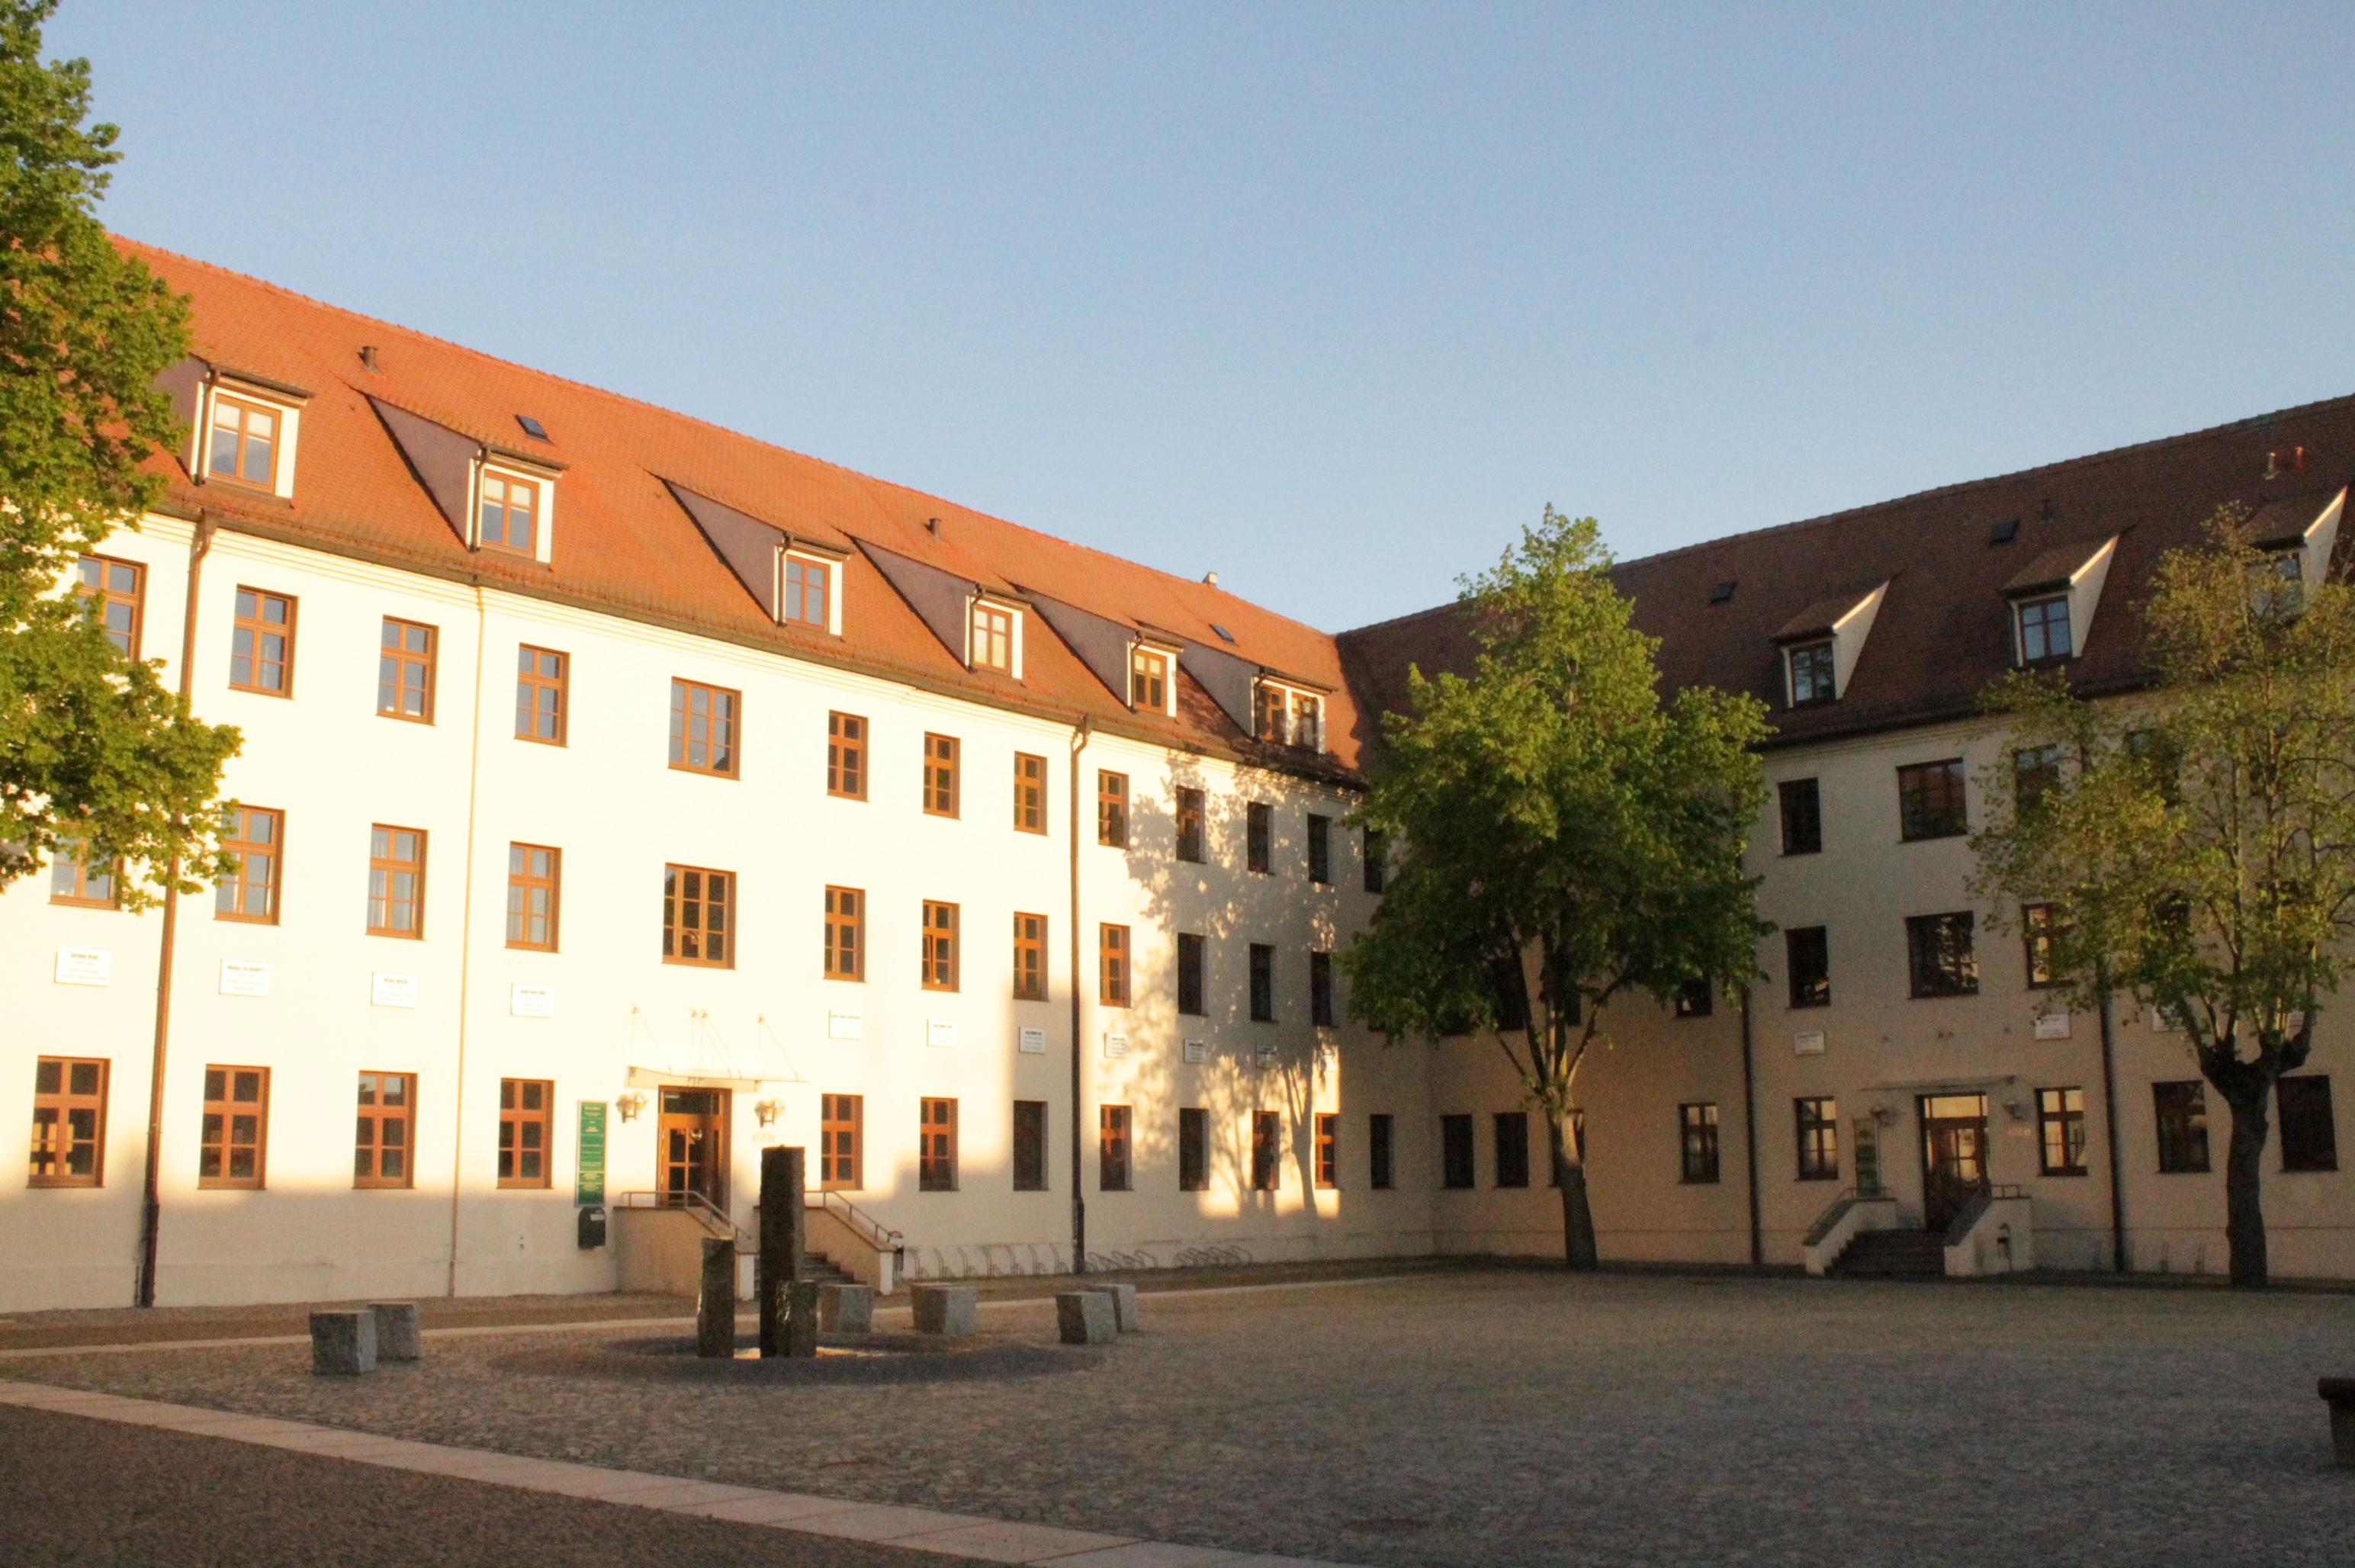 File:Quadrangle, Wittenberg University, Germany jpg